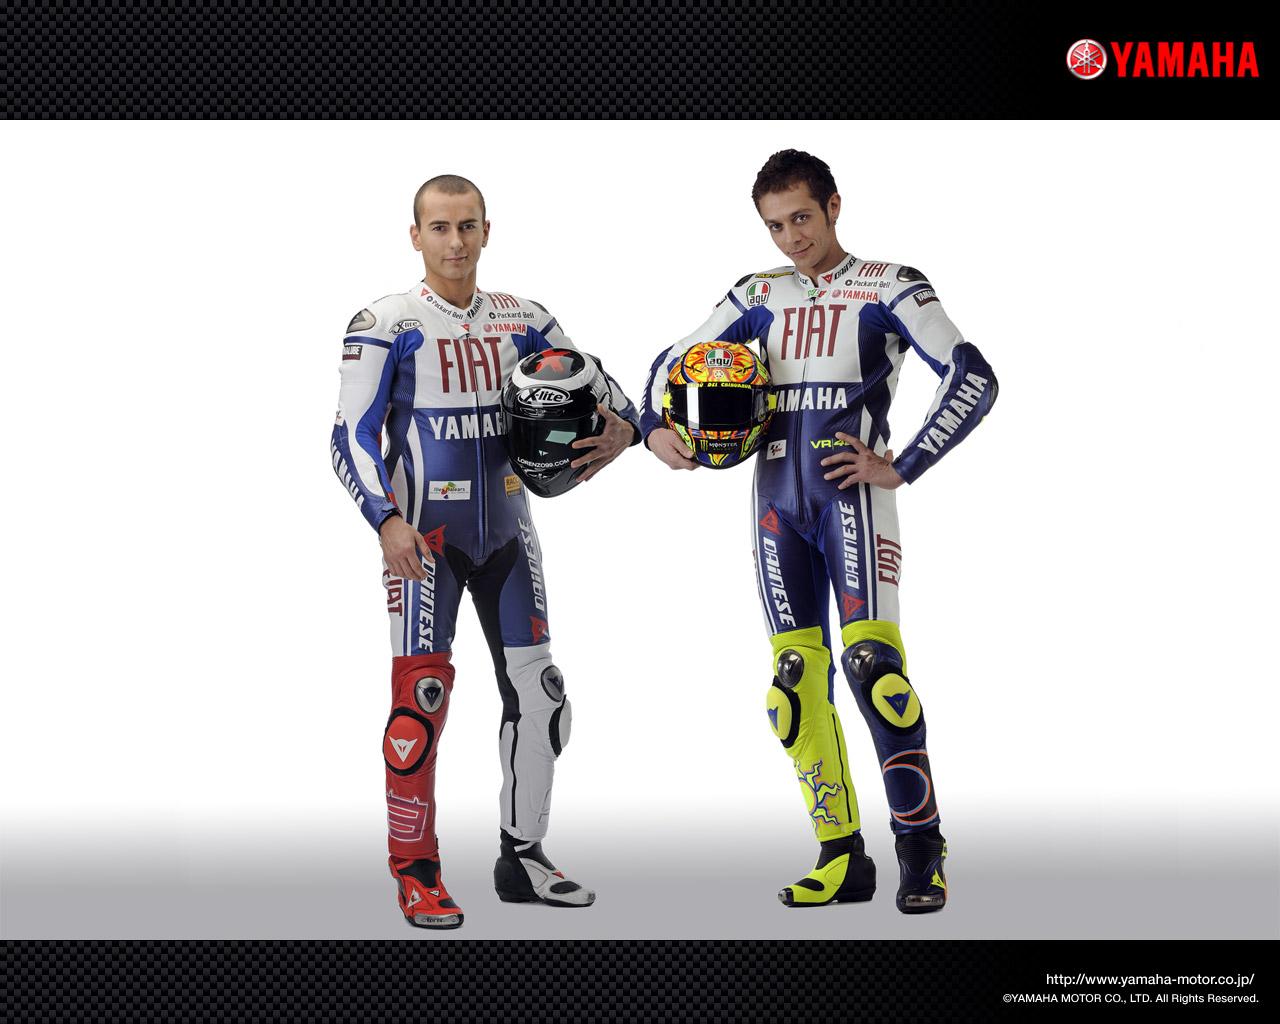 Jorge Lorenzo and Valentino Rossi - MotoGP 2009 Fiat Yamaha Team | Racing Wallpapers